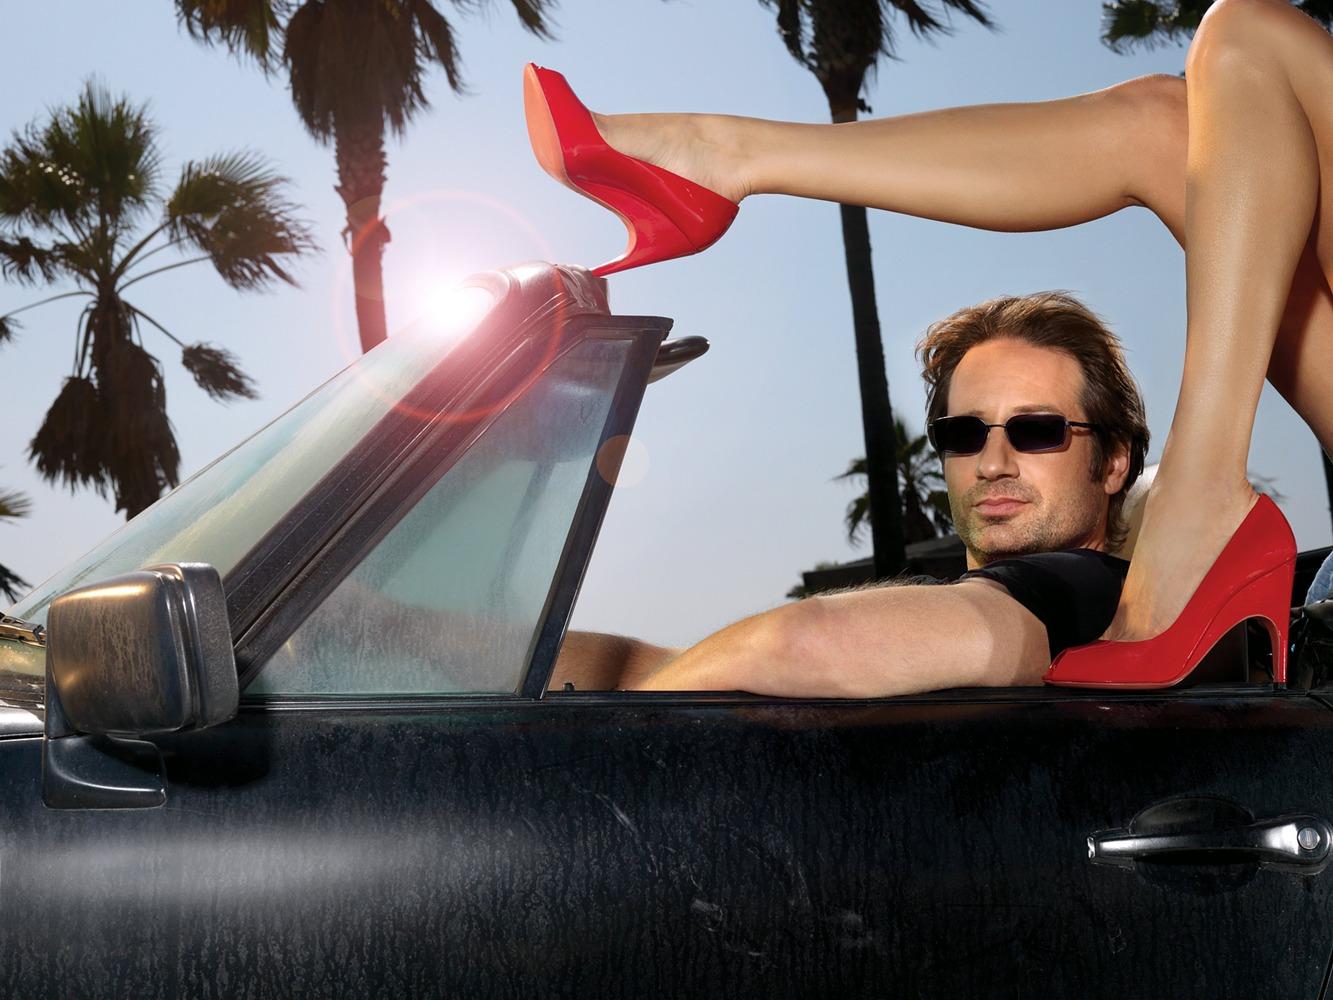 Californication - Hank Moody